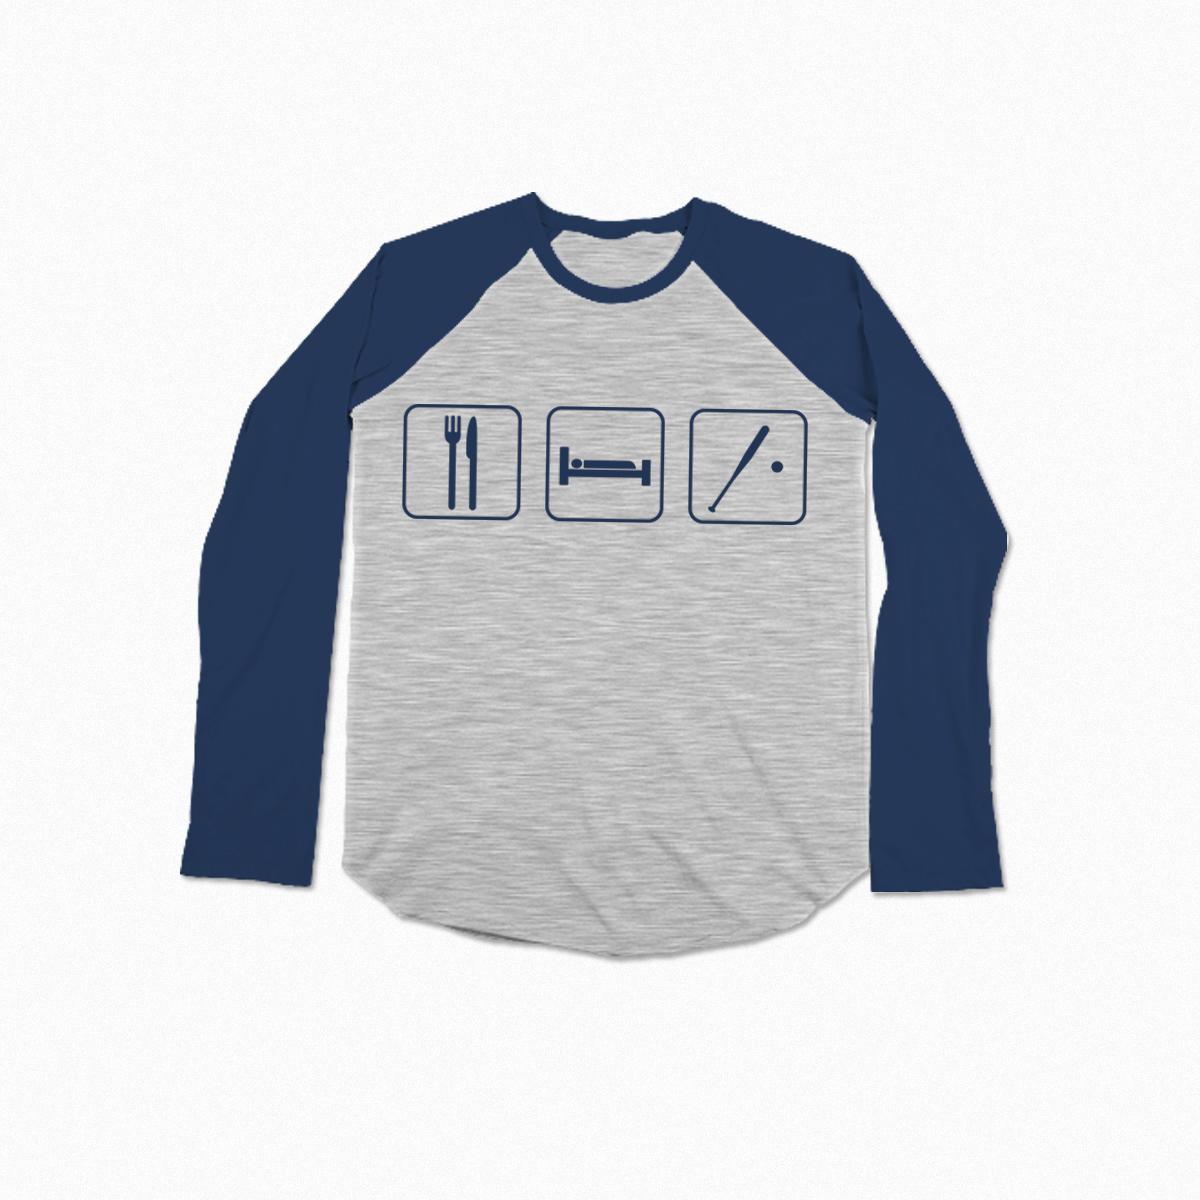 Eat Sleep Baseball by AdamNiemet on Threadless